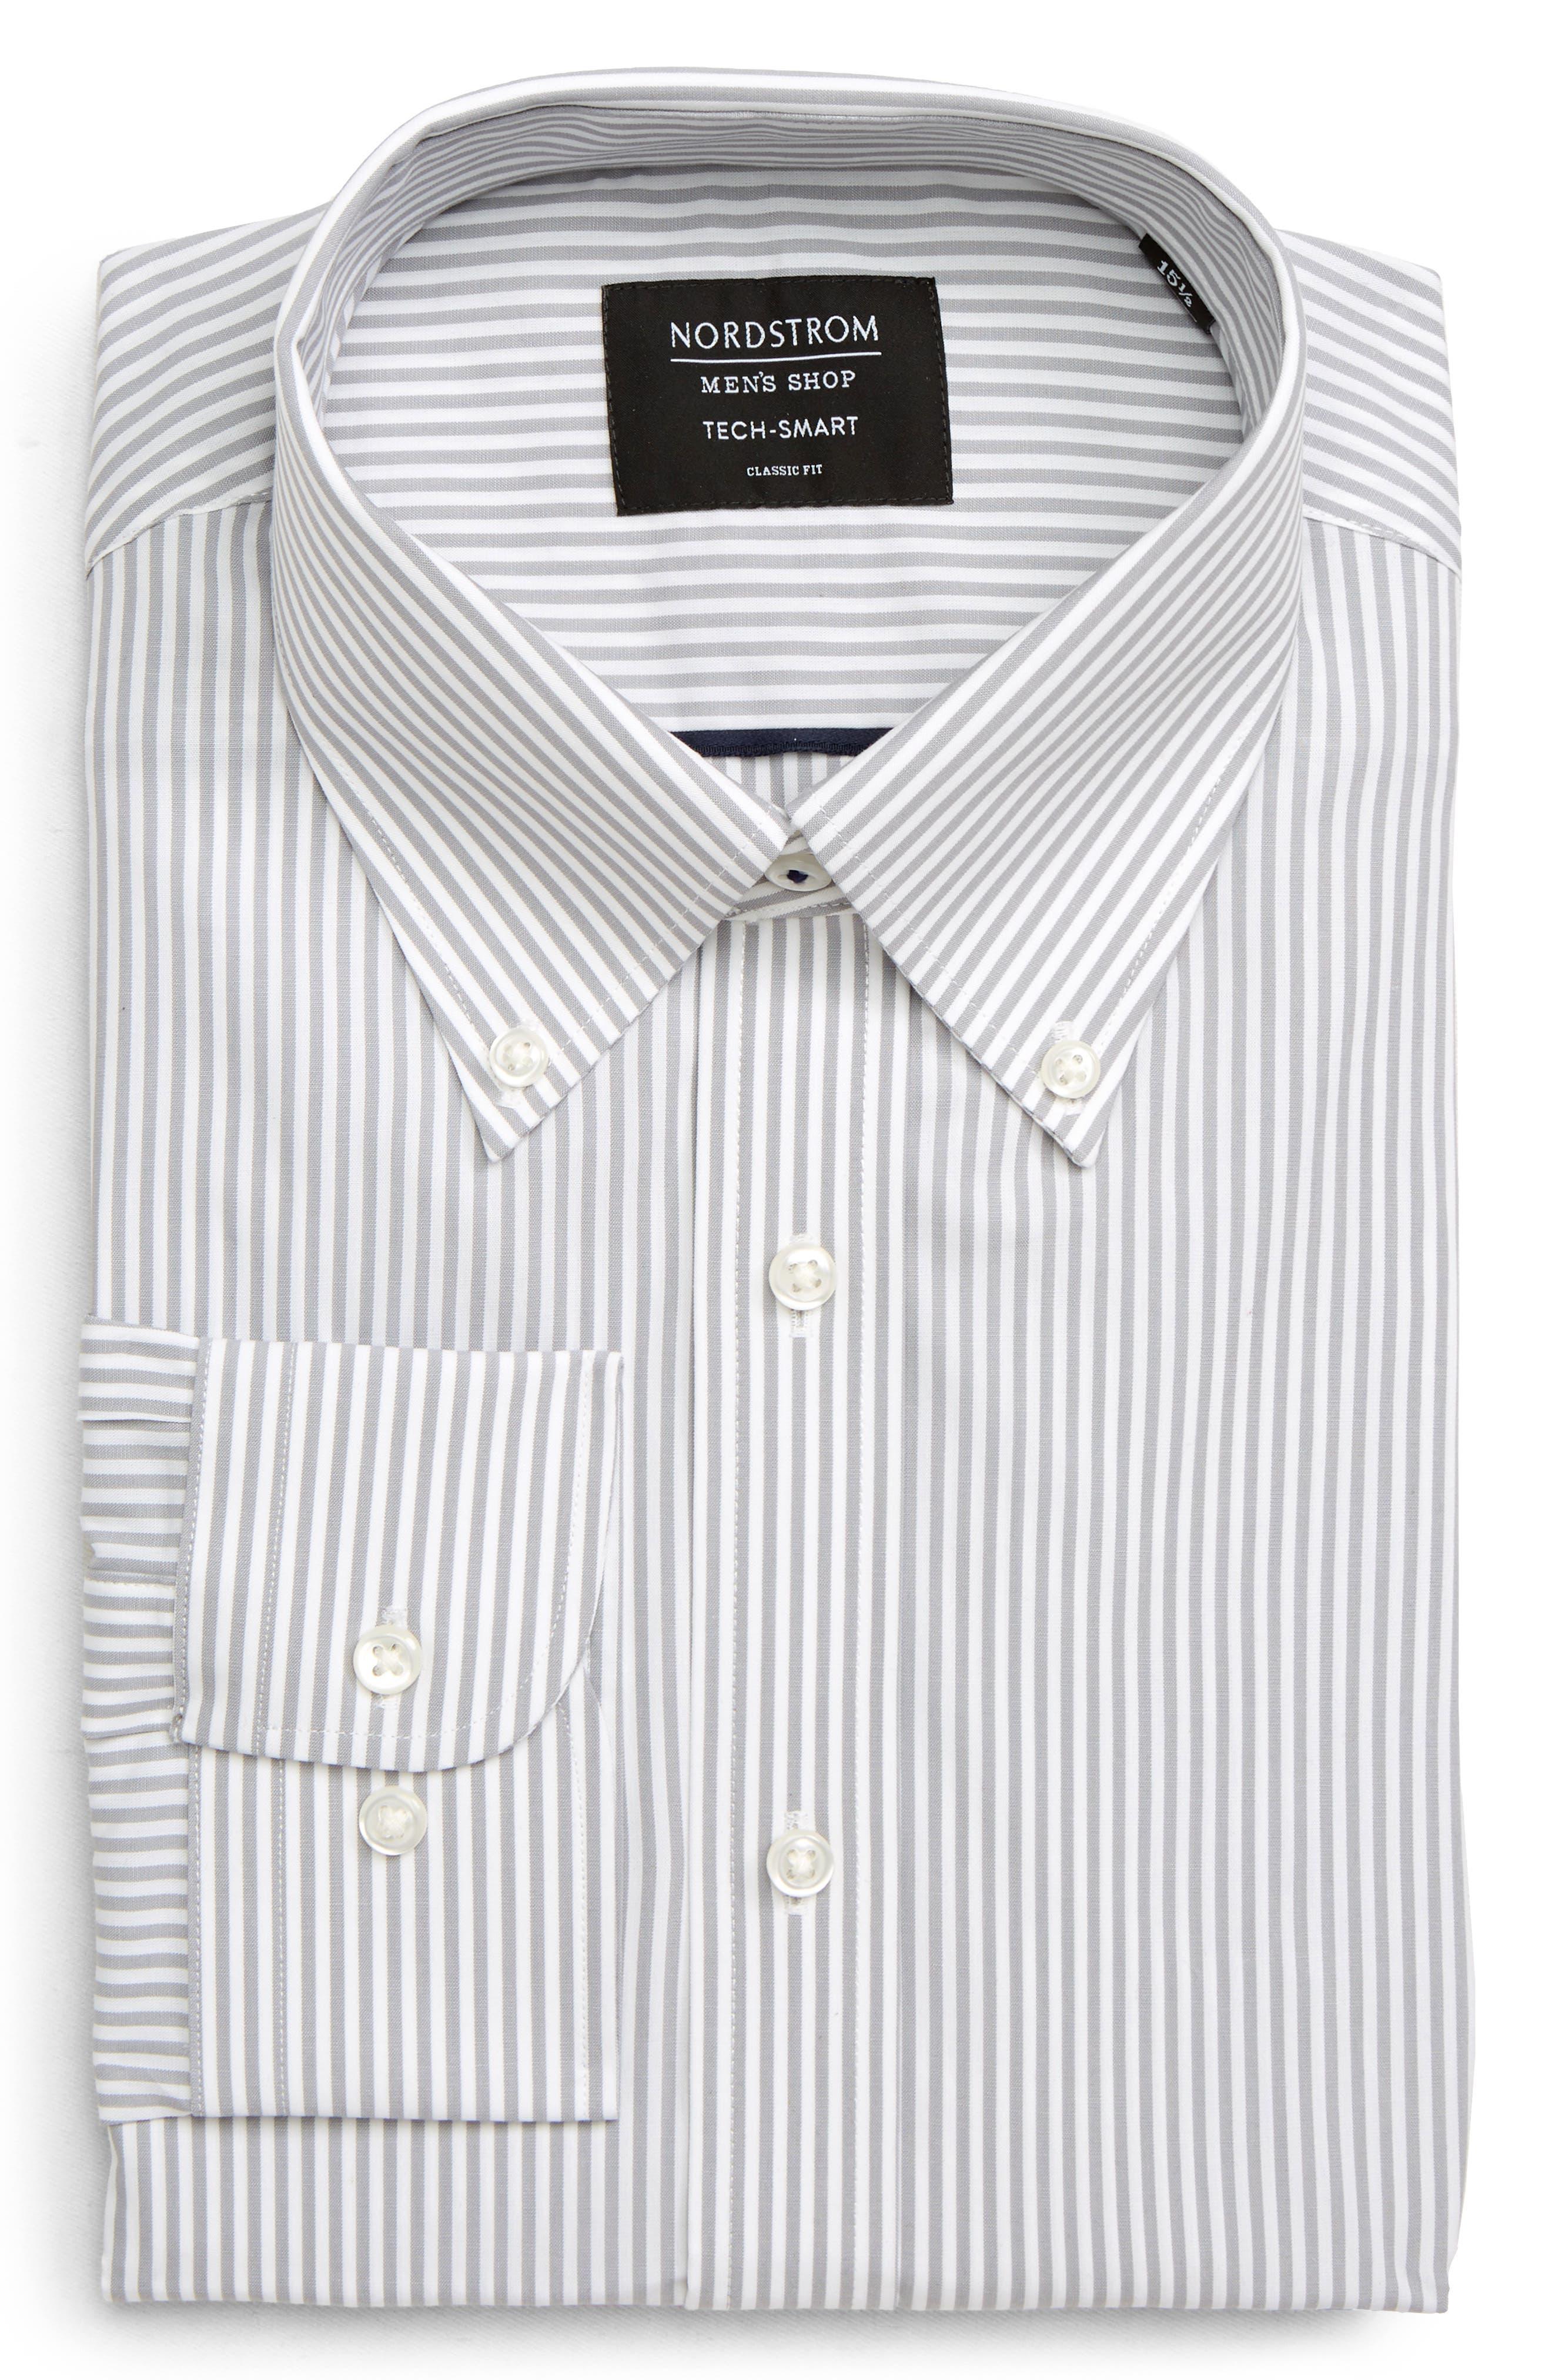 NORDSTROM MEN'S SHOP Tech-Smart Classic Fit Stretch Stripe Dress Shirt, Main, color, GREY SLEET